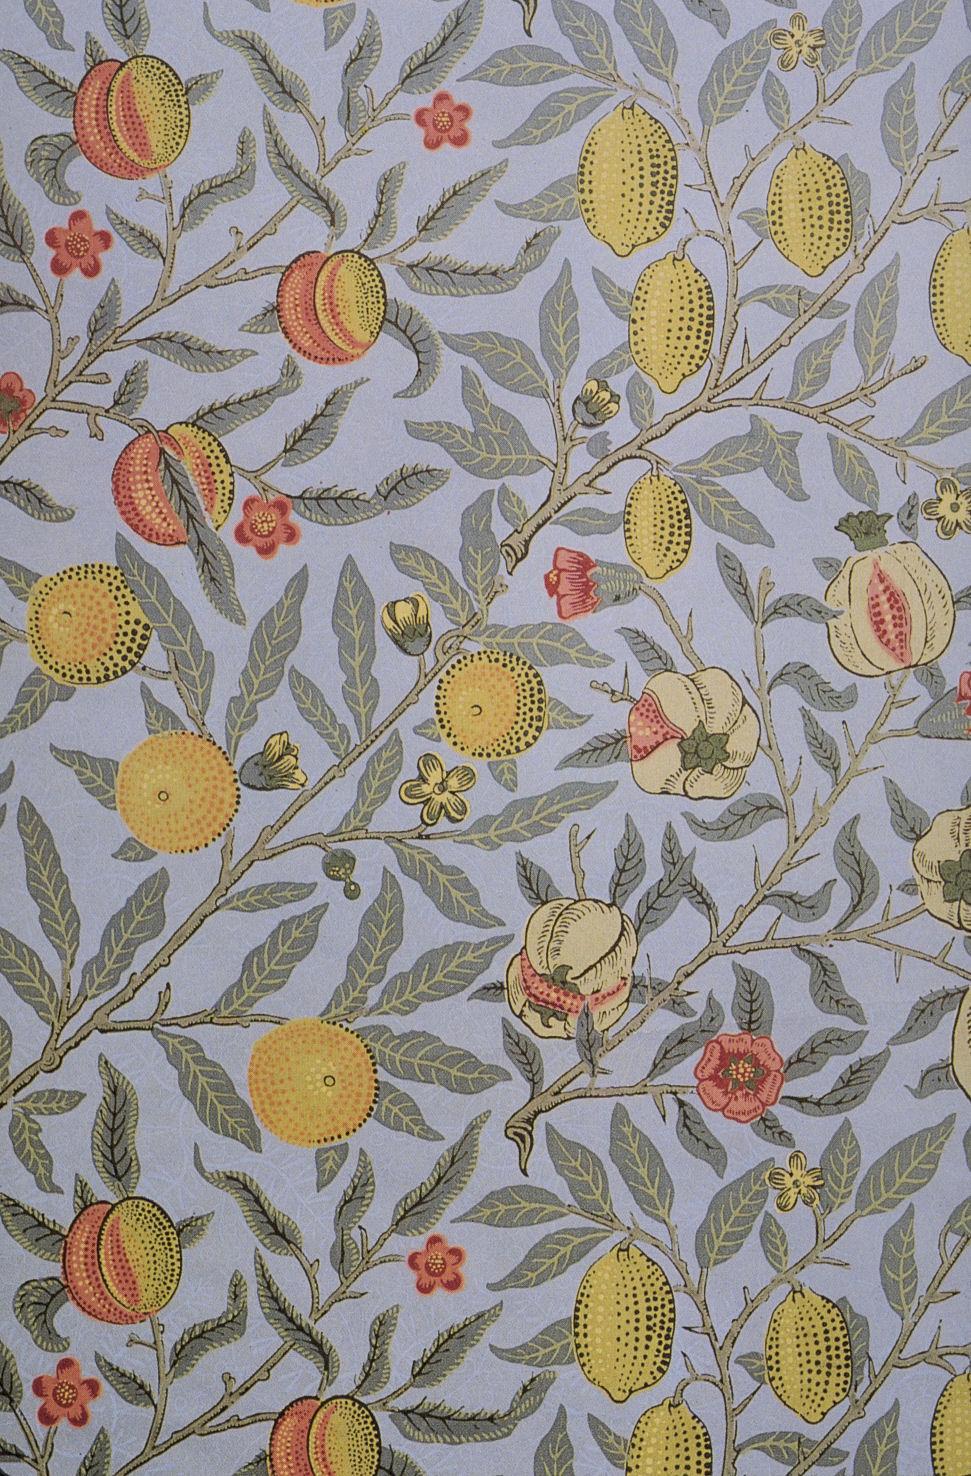 file morris fruit wallpaper c wikimedia commons